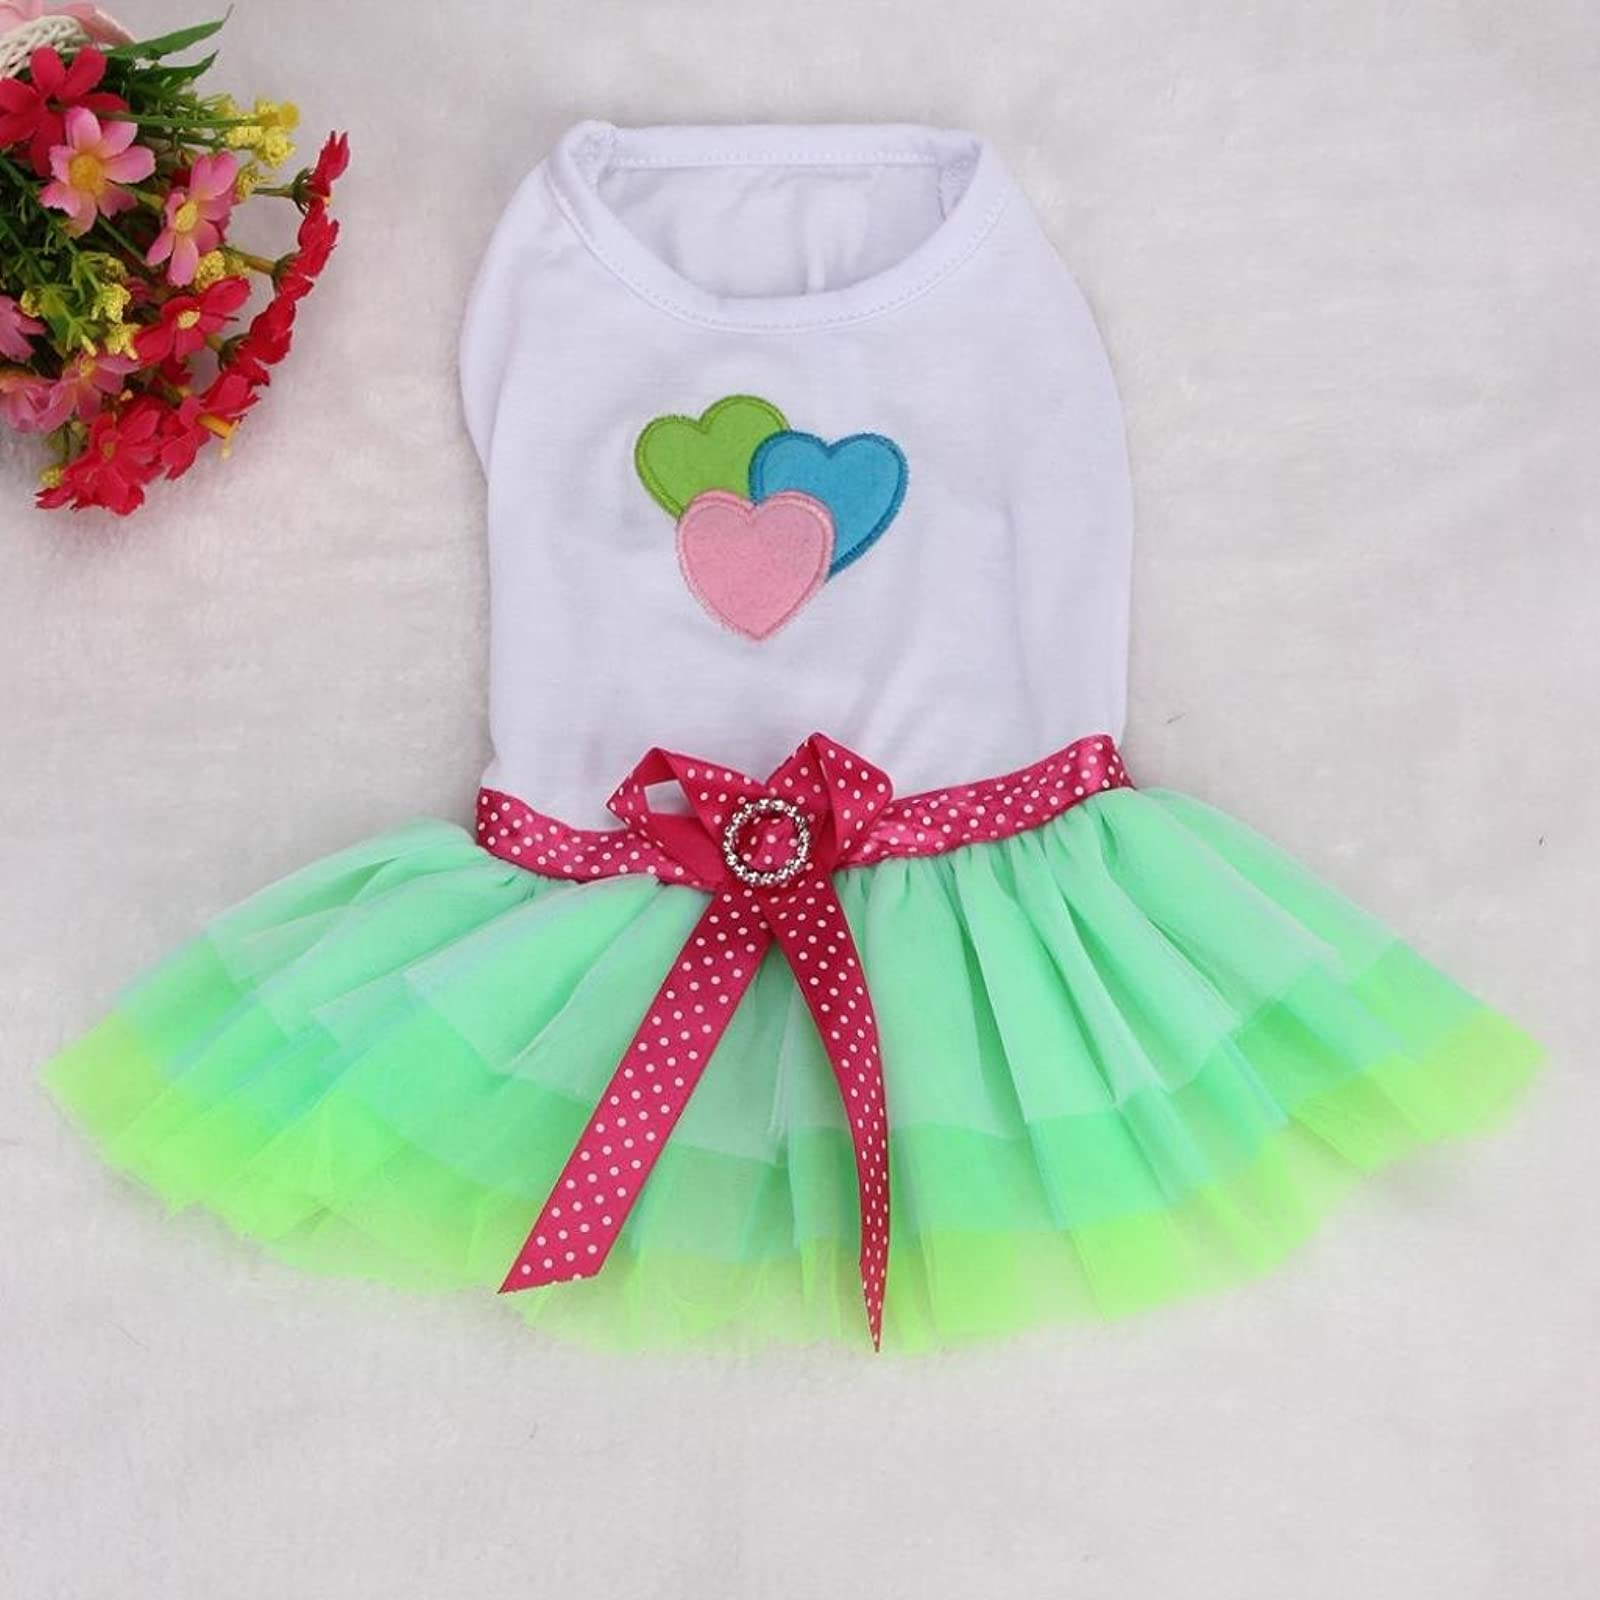 OutTop Girl Dog Dress Lace Princess Tutu WSM60224084S_YD - 1